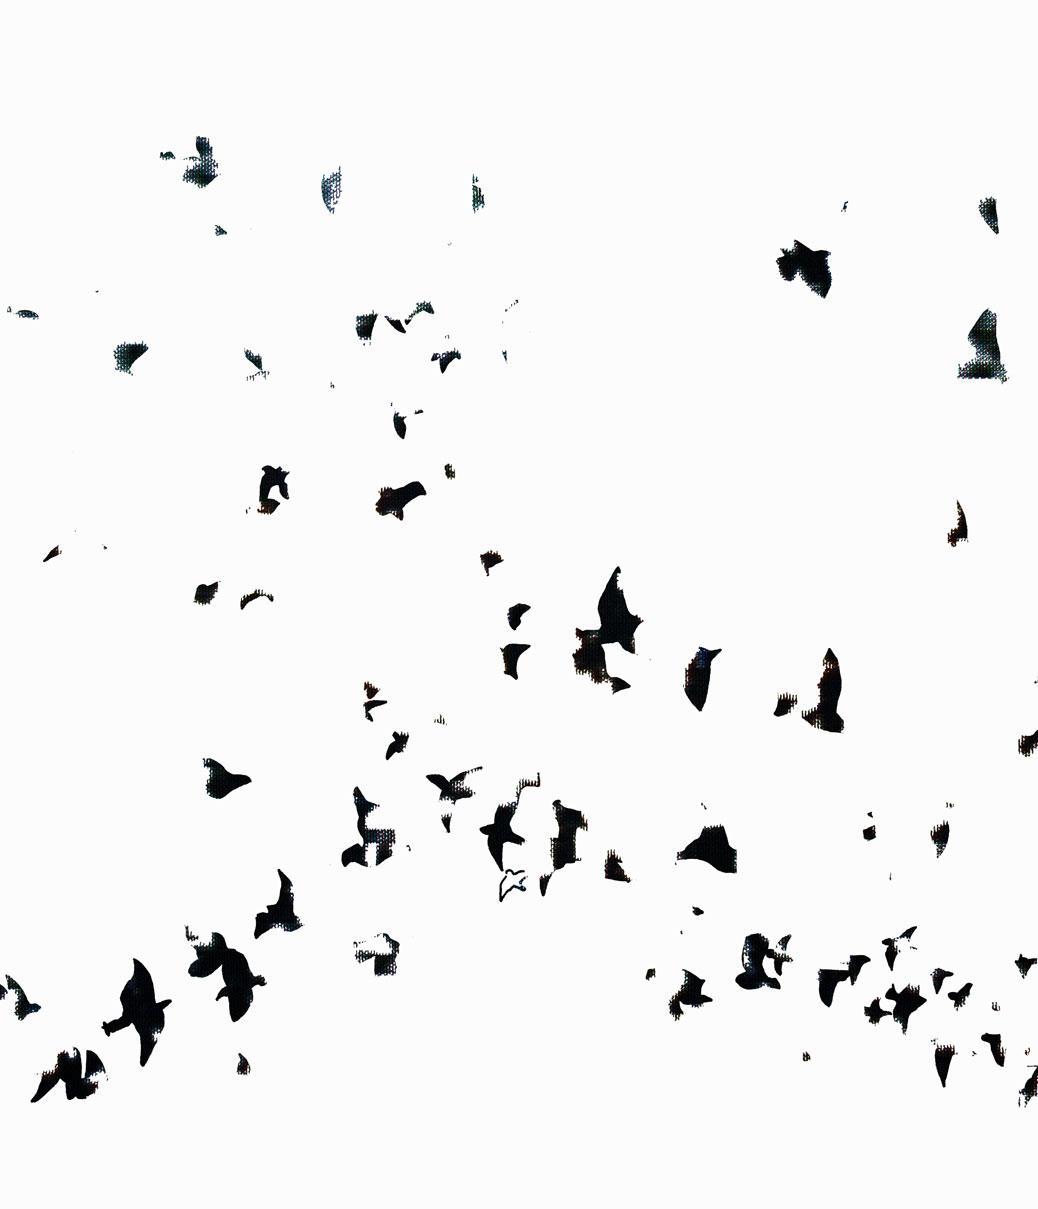 'Flock', 2008